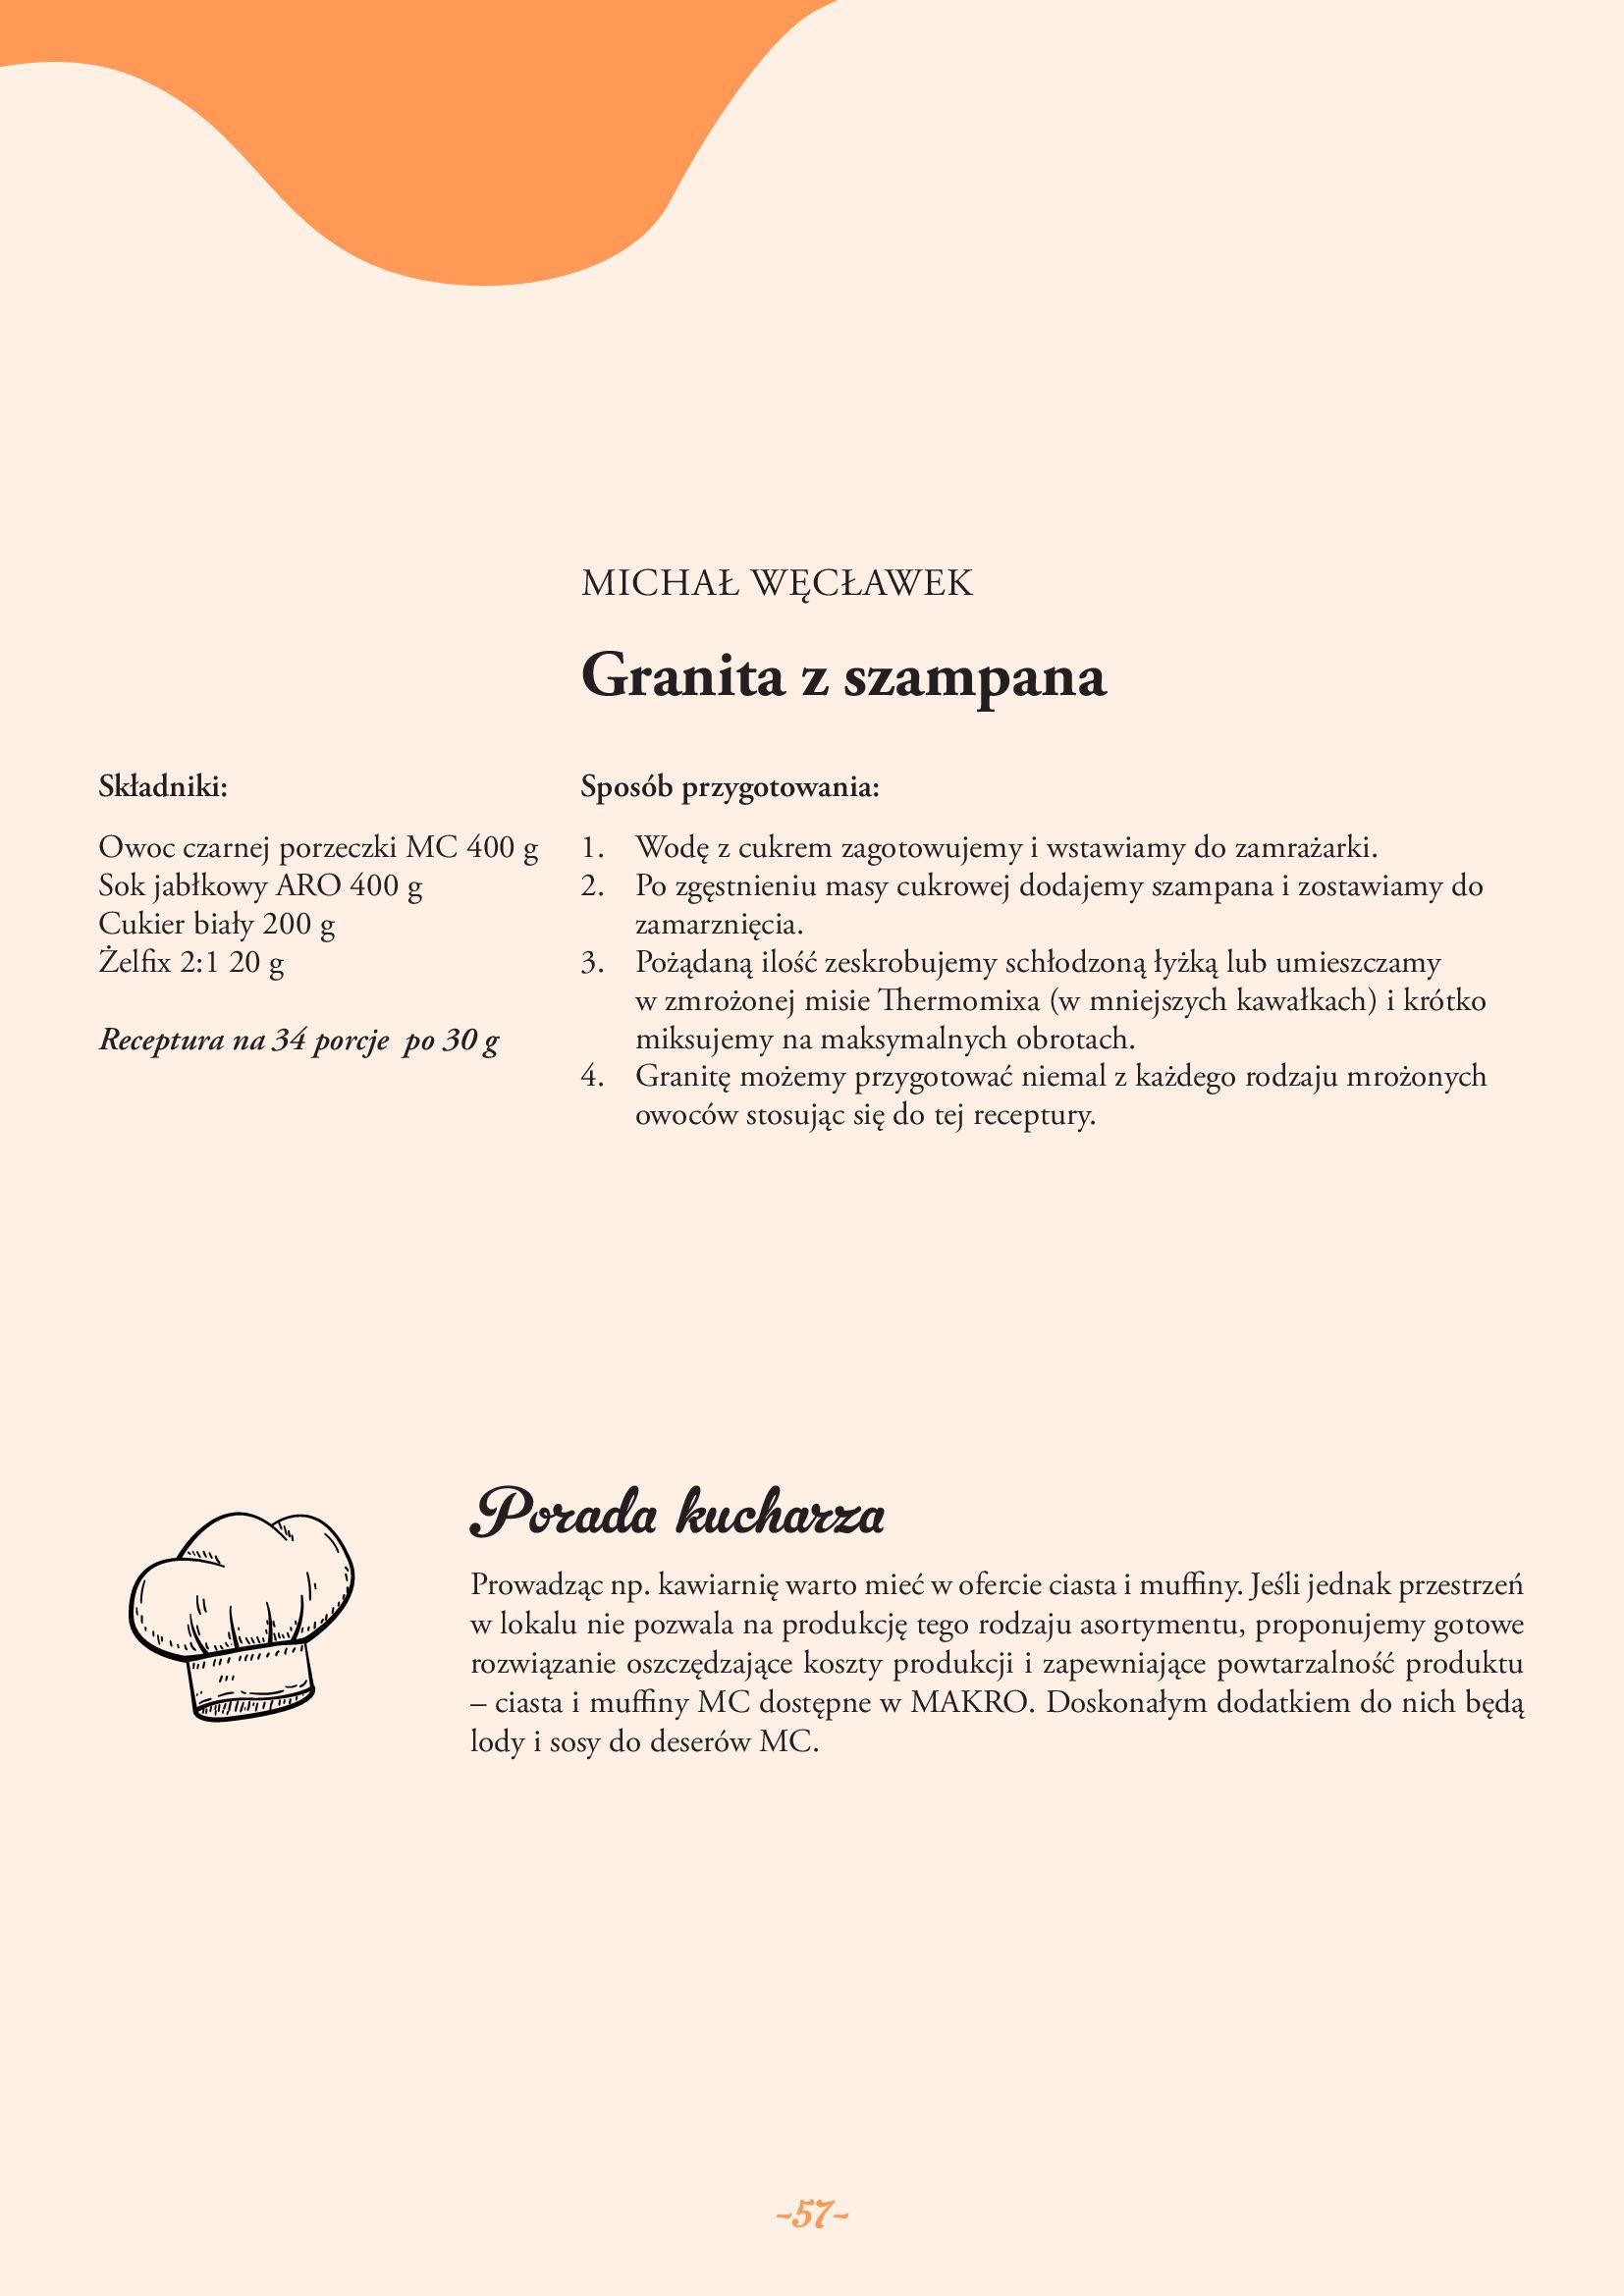 Gazetka Makro: Gazetka Makro - lody i desery 2021-05-21 page-57